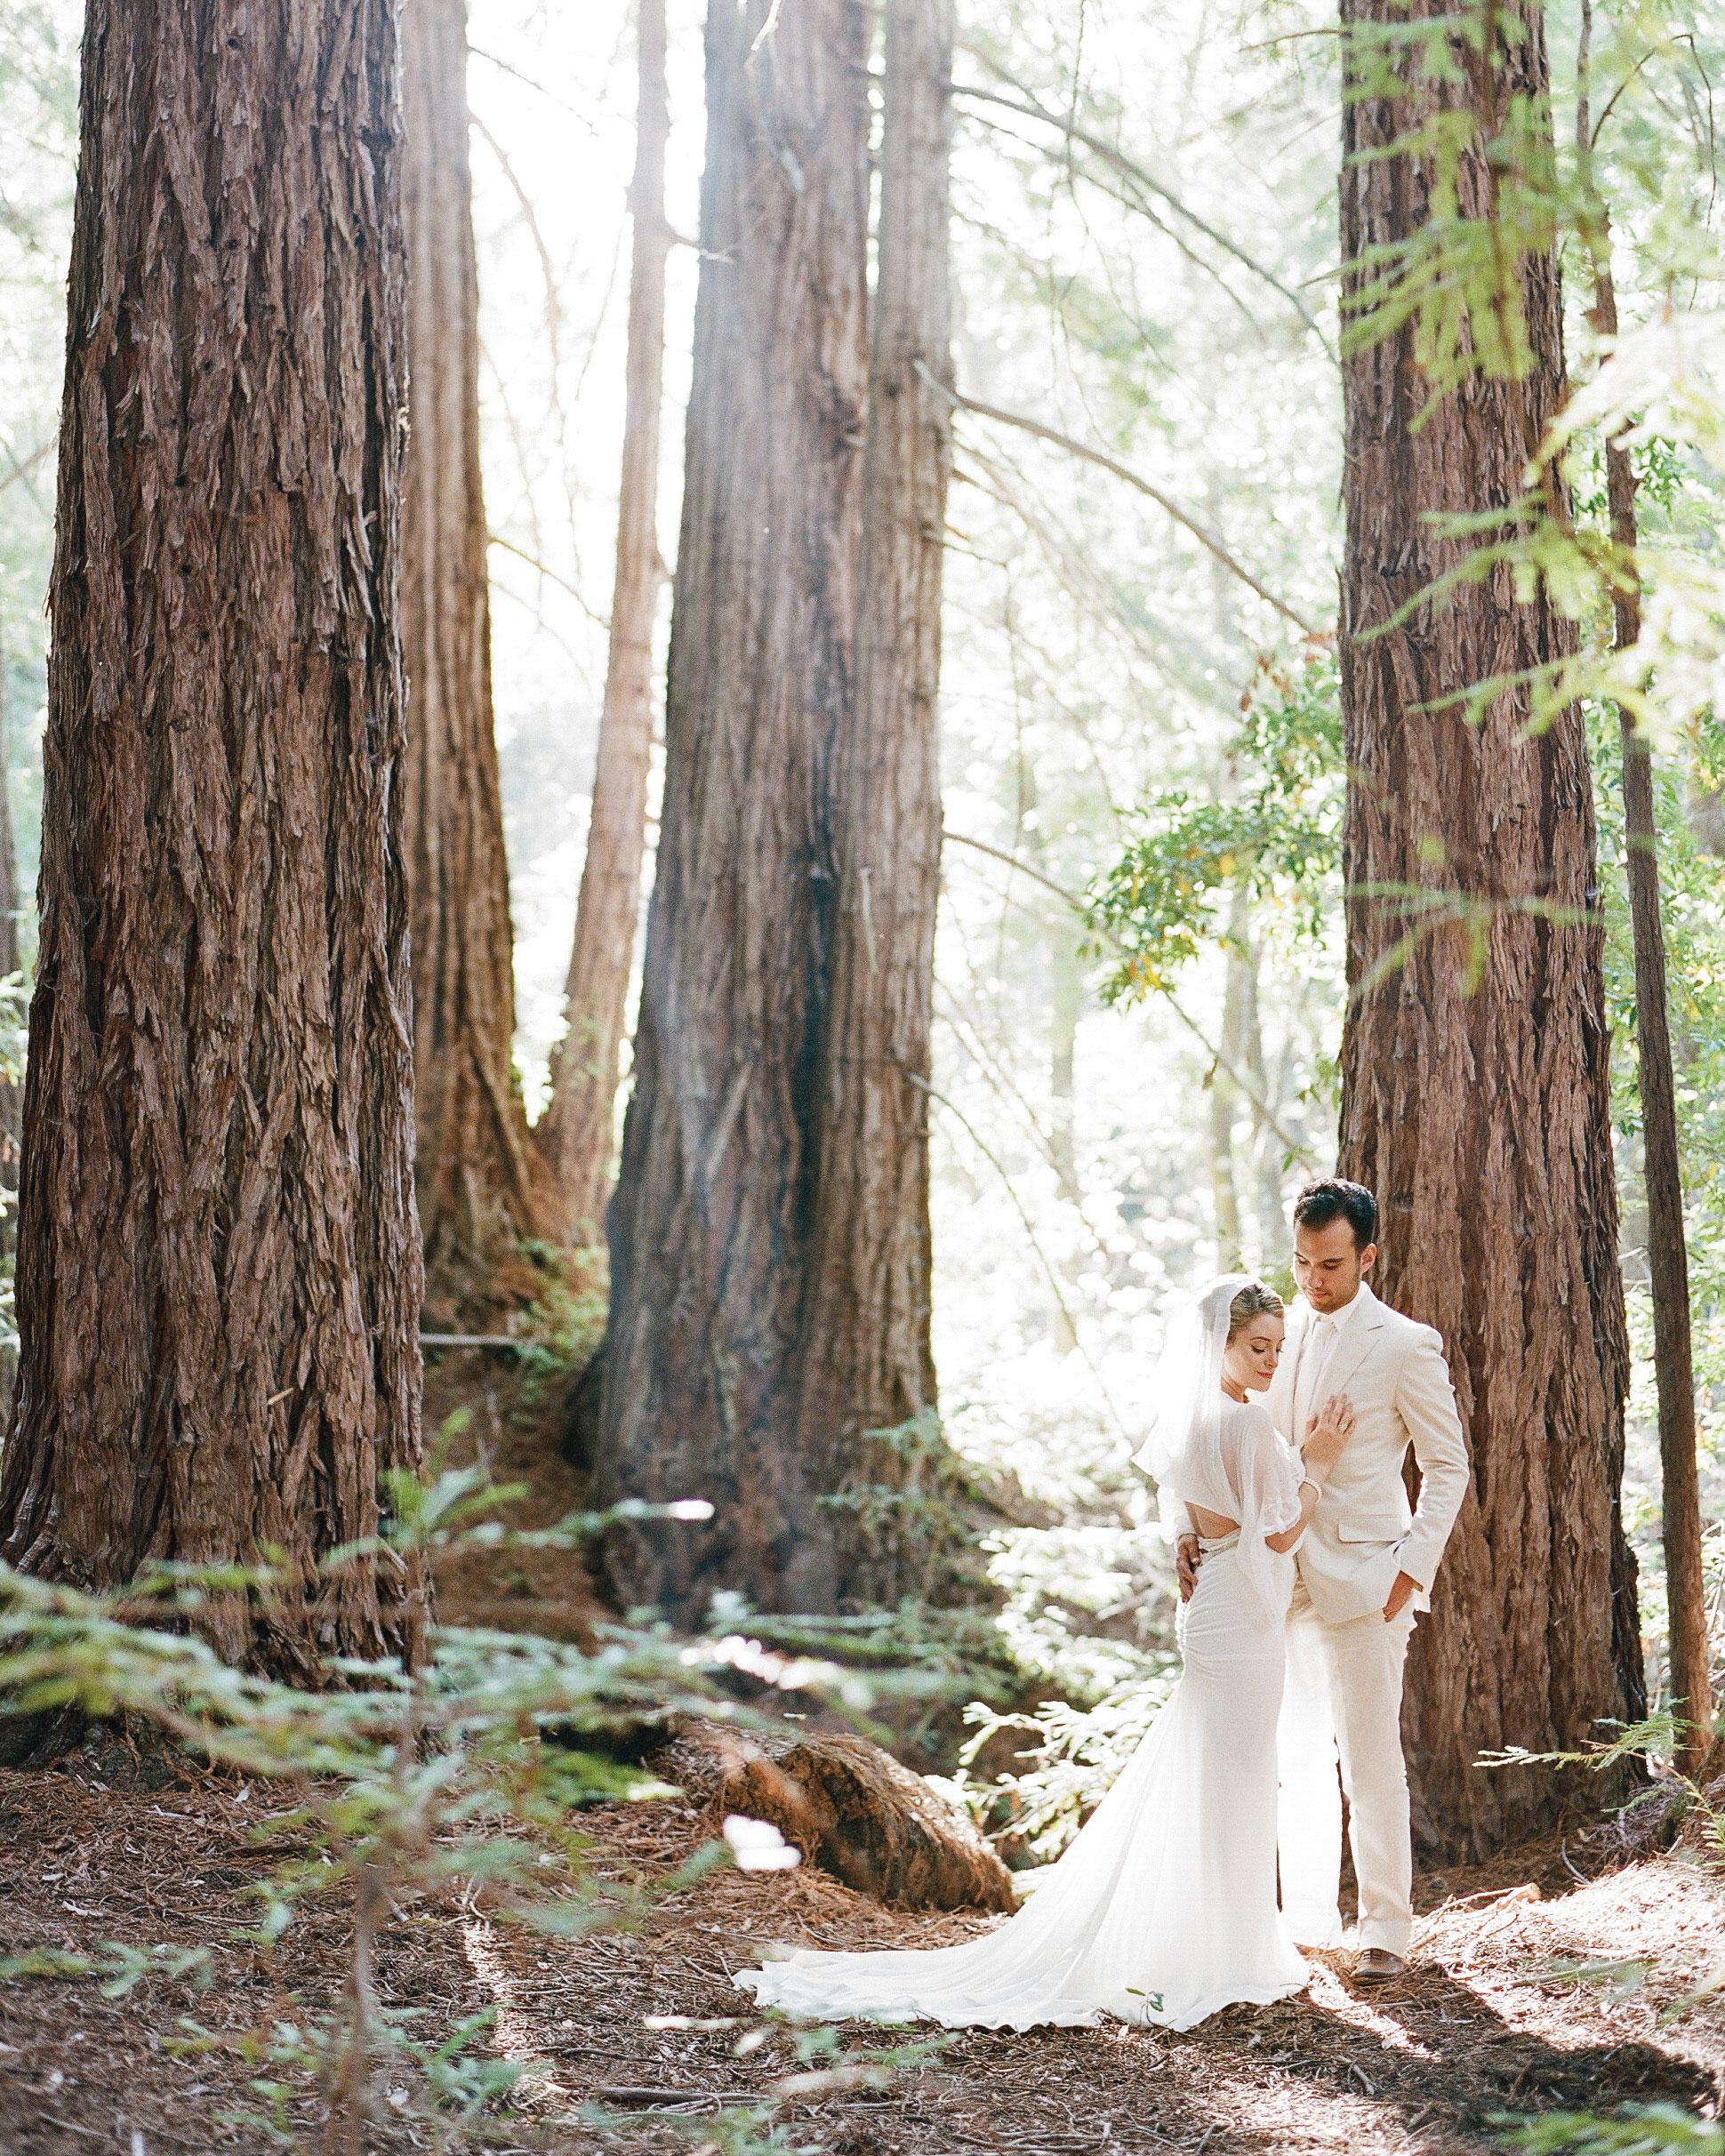 breelayne-hunter-wedding-california-bride-groom-portrait-redwoods-0069-barn-santa-lucia-preserve-s112849.jpg